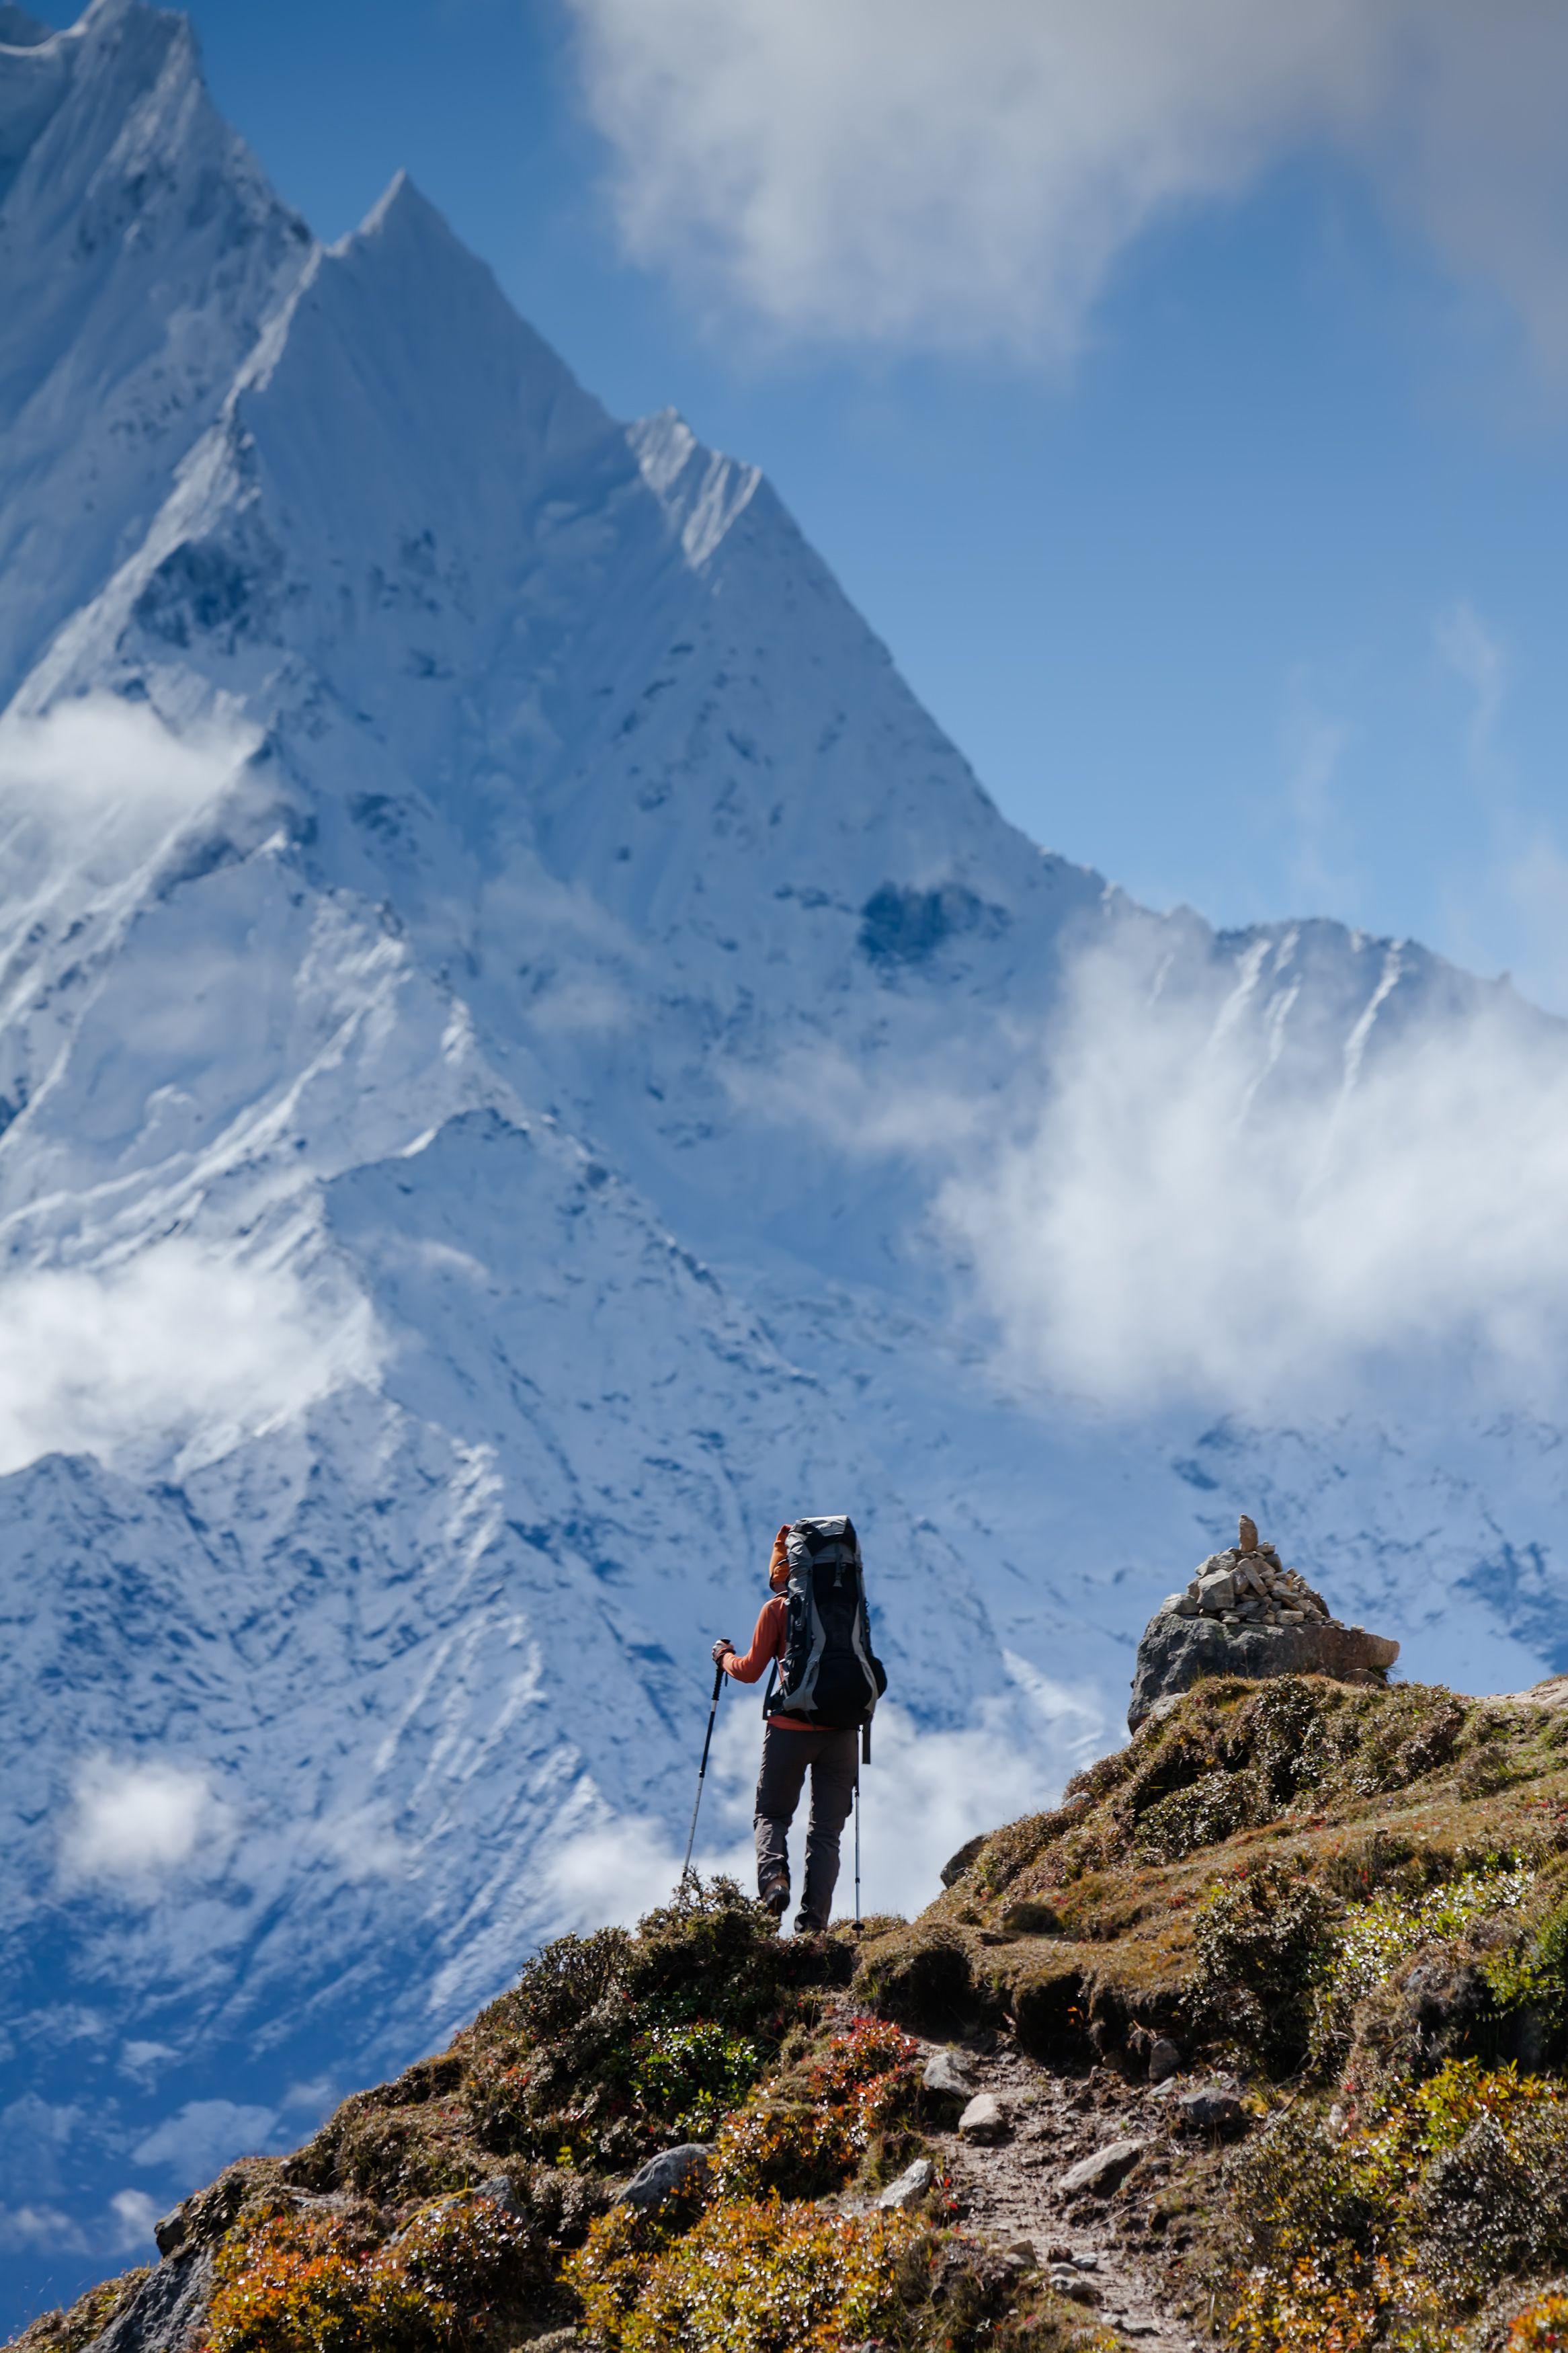 Nagarkot And Changu Narayan Hiking Tour From Kathmandu In